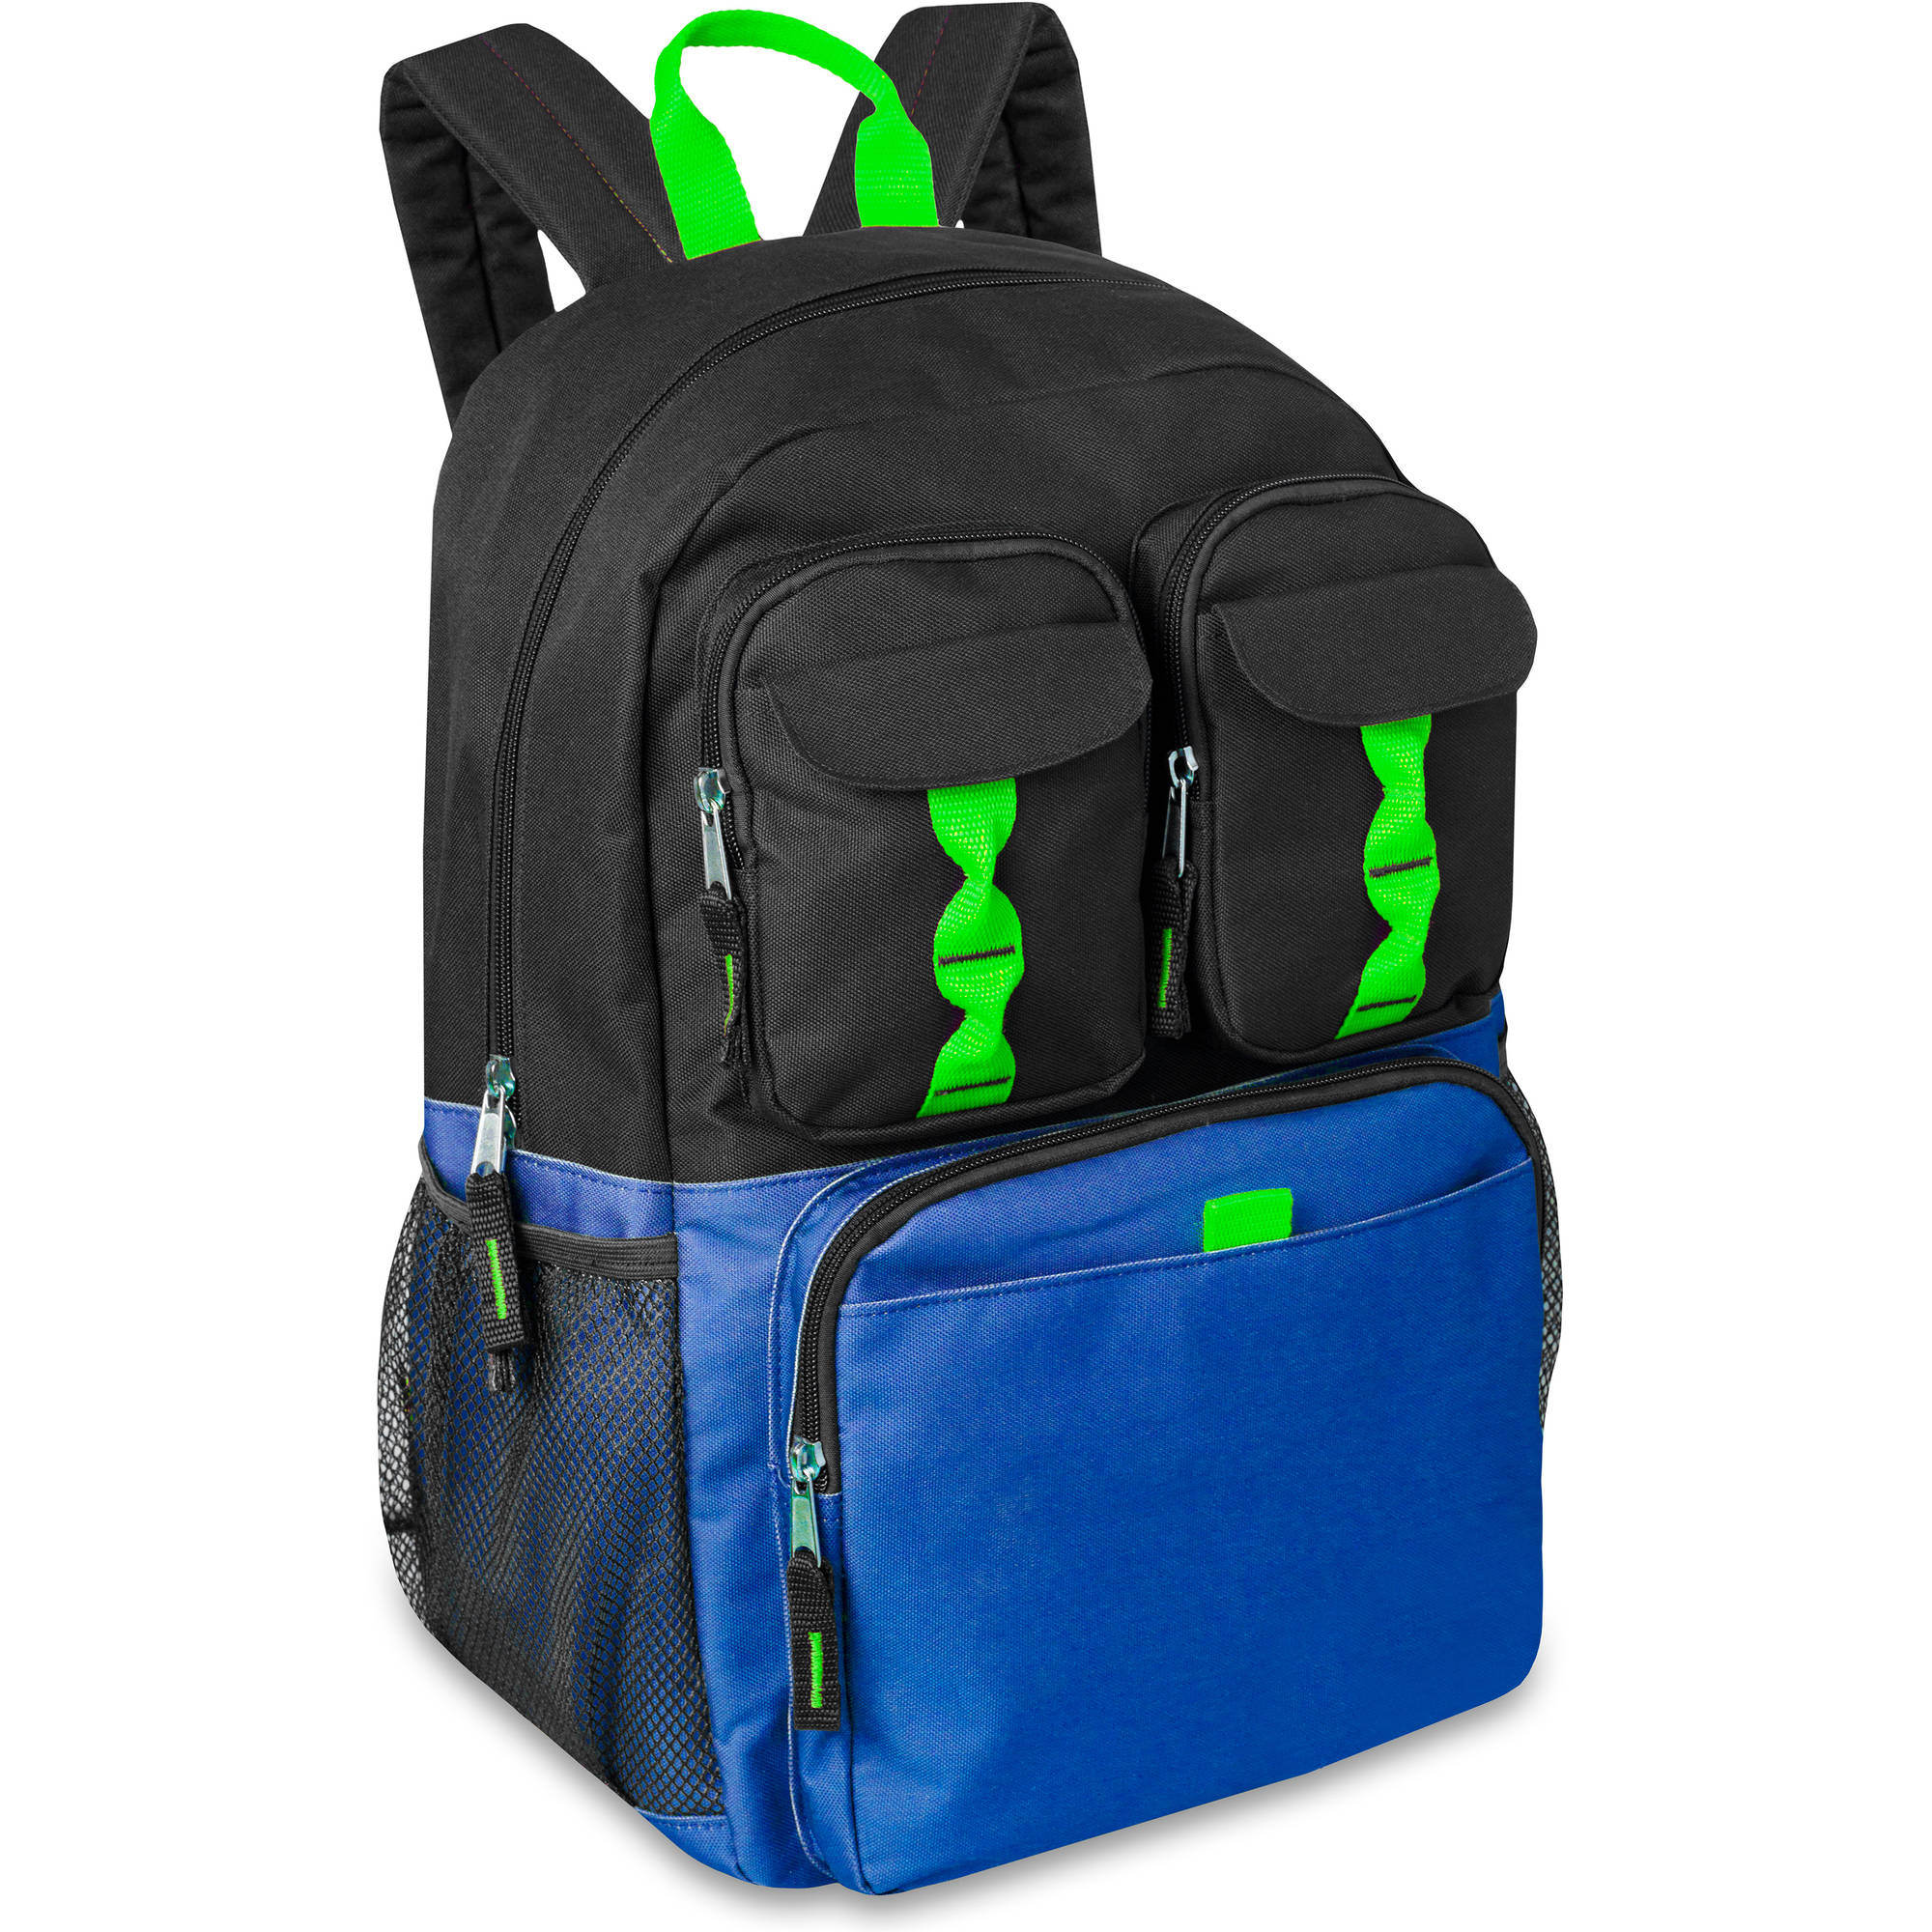 18 Inch Deluxe Quadruple Pocket Backpack